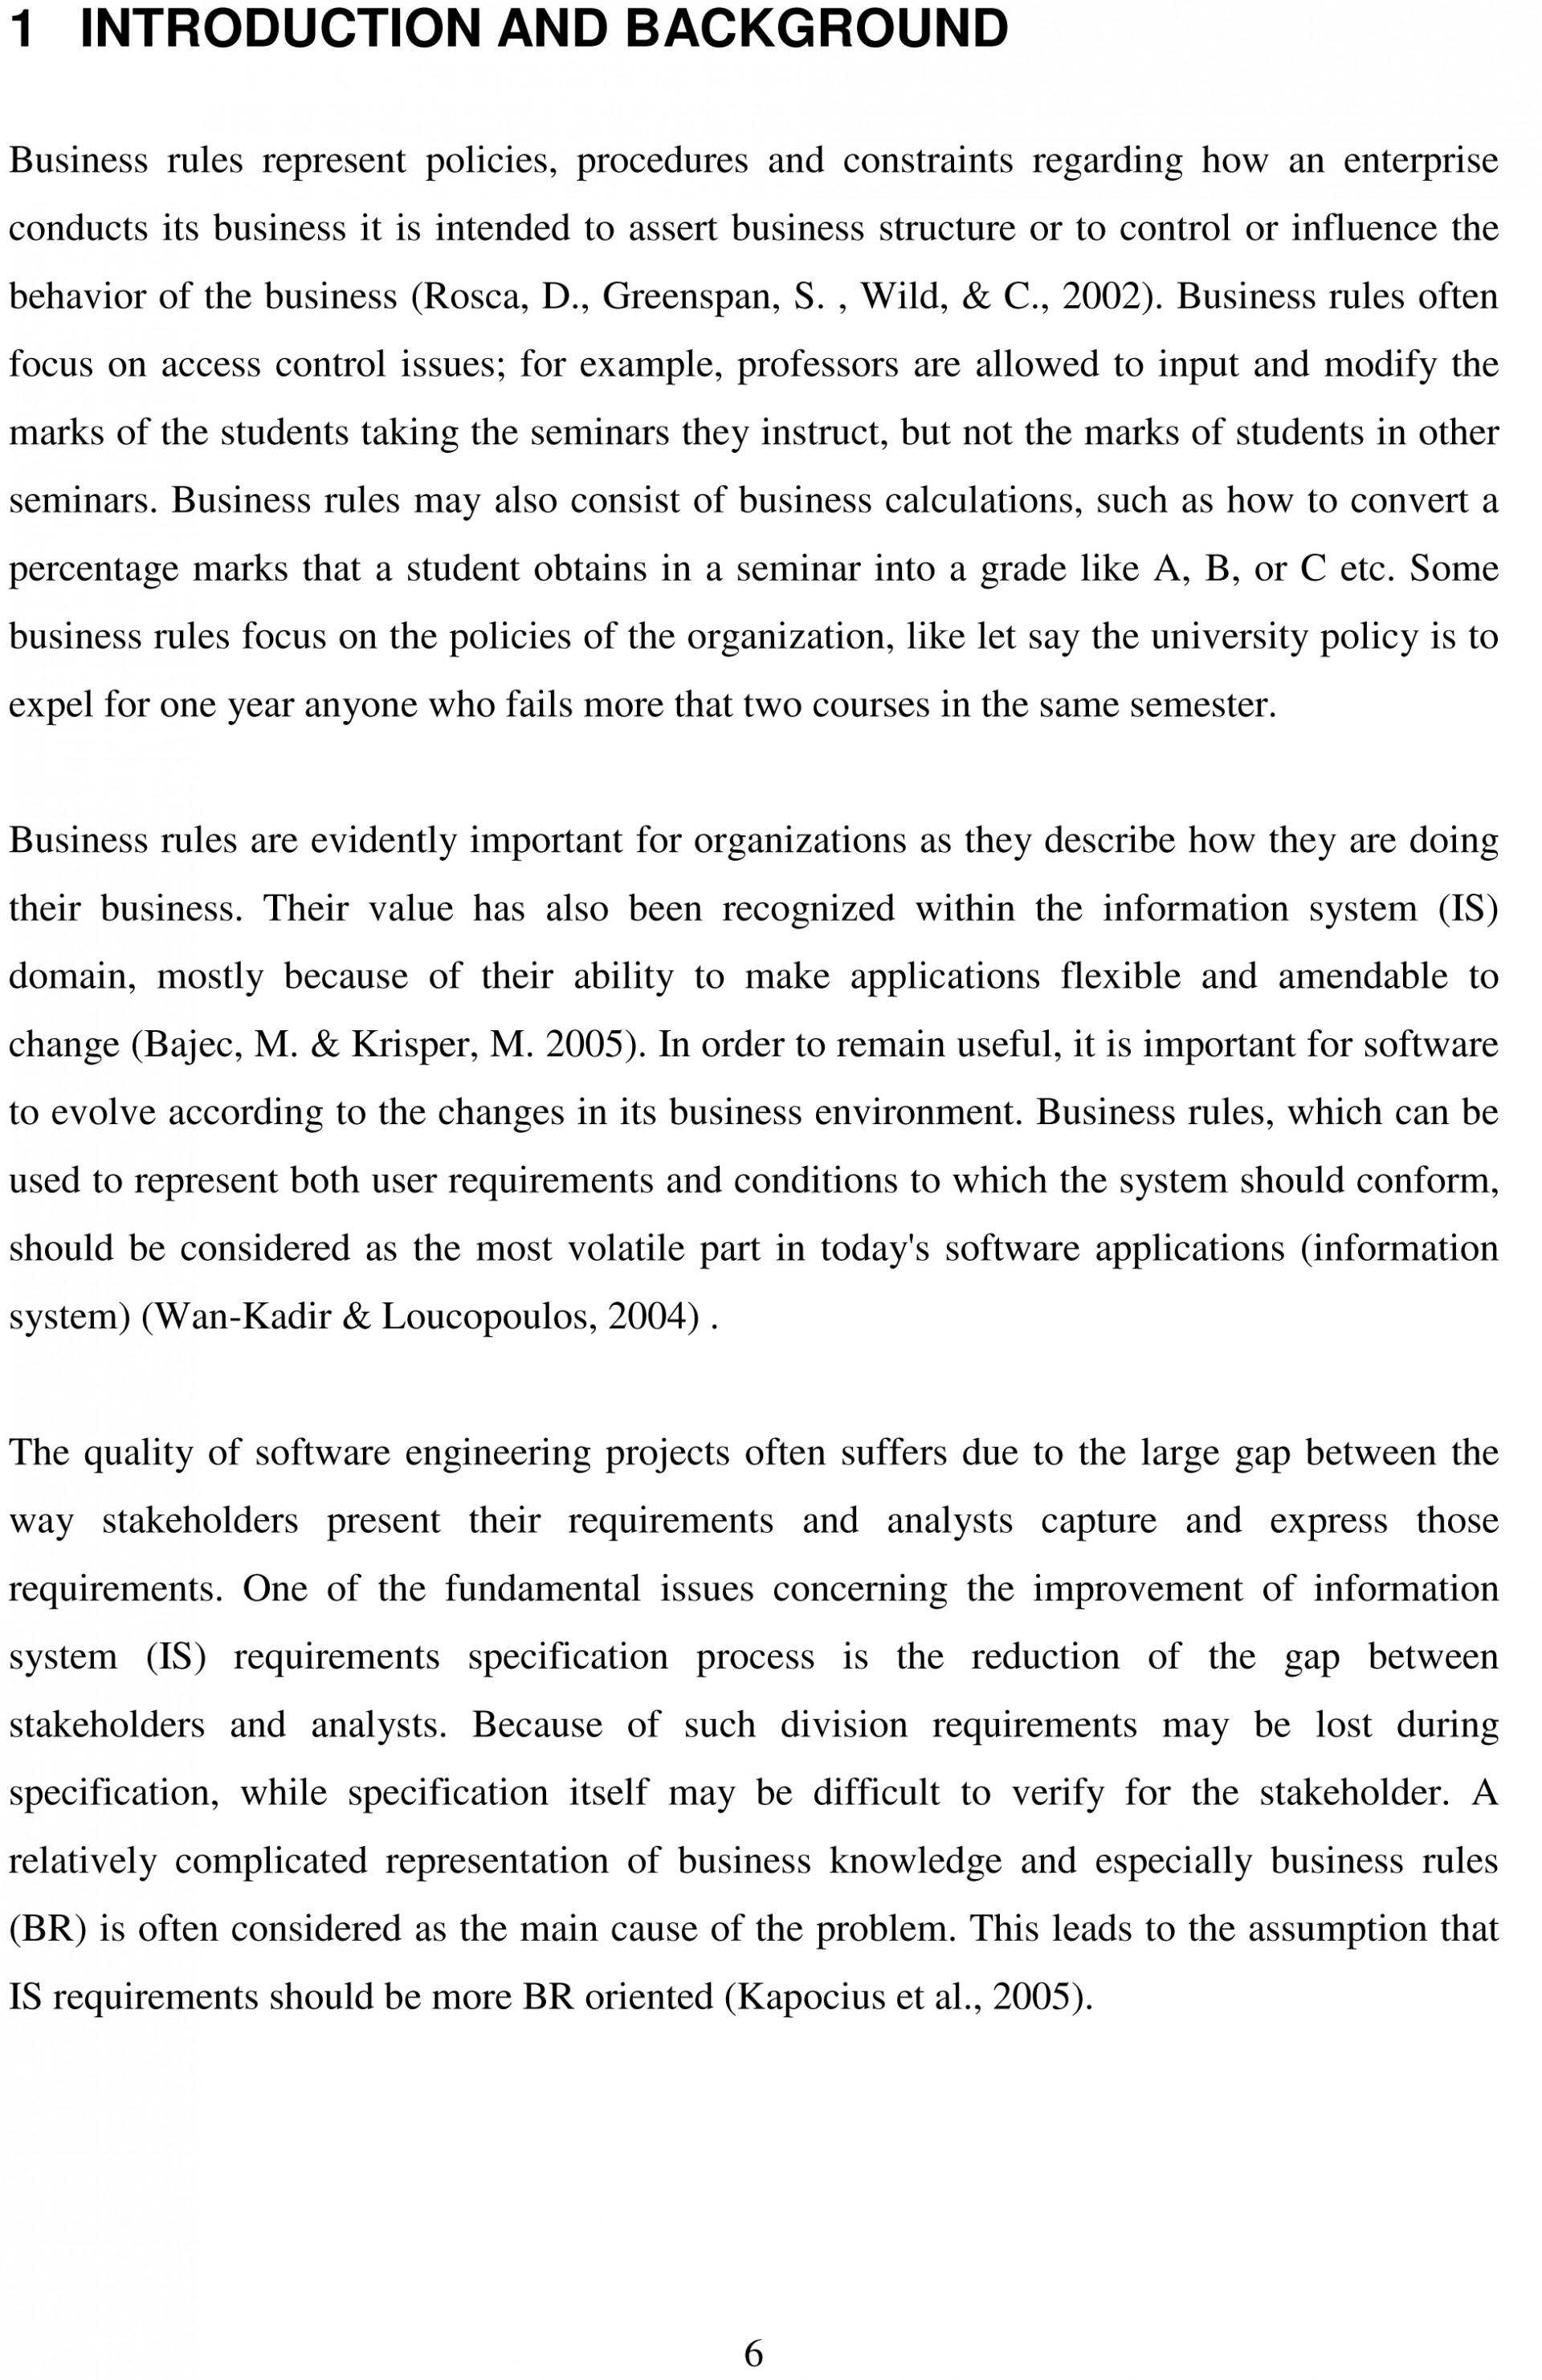 017 Thesis Free Sample1 Write My Essay For Shocking App Argumentative Online 1920